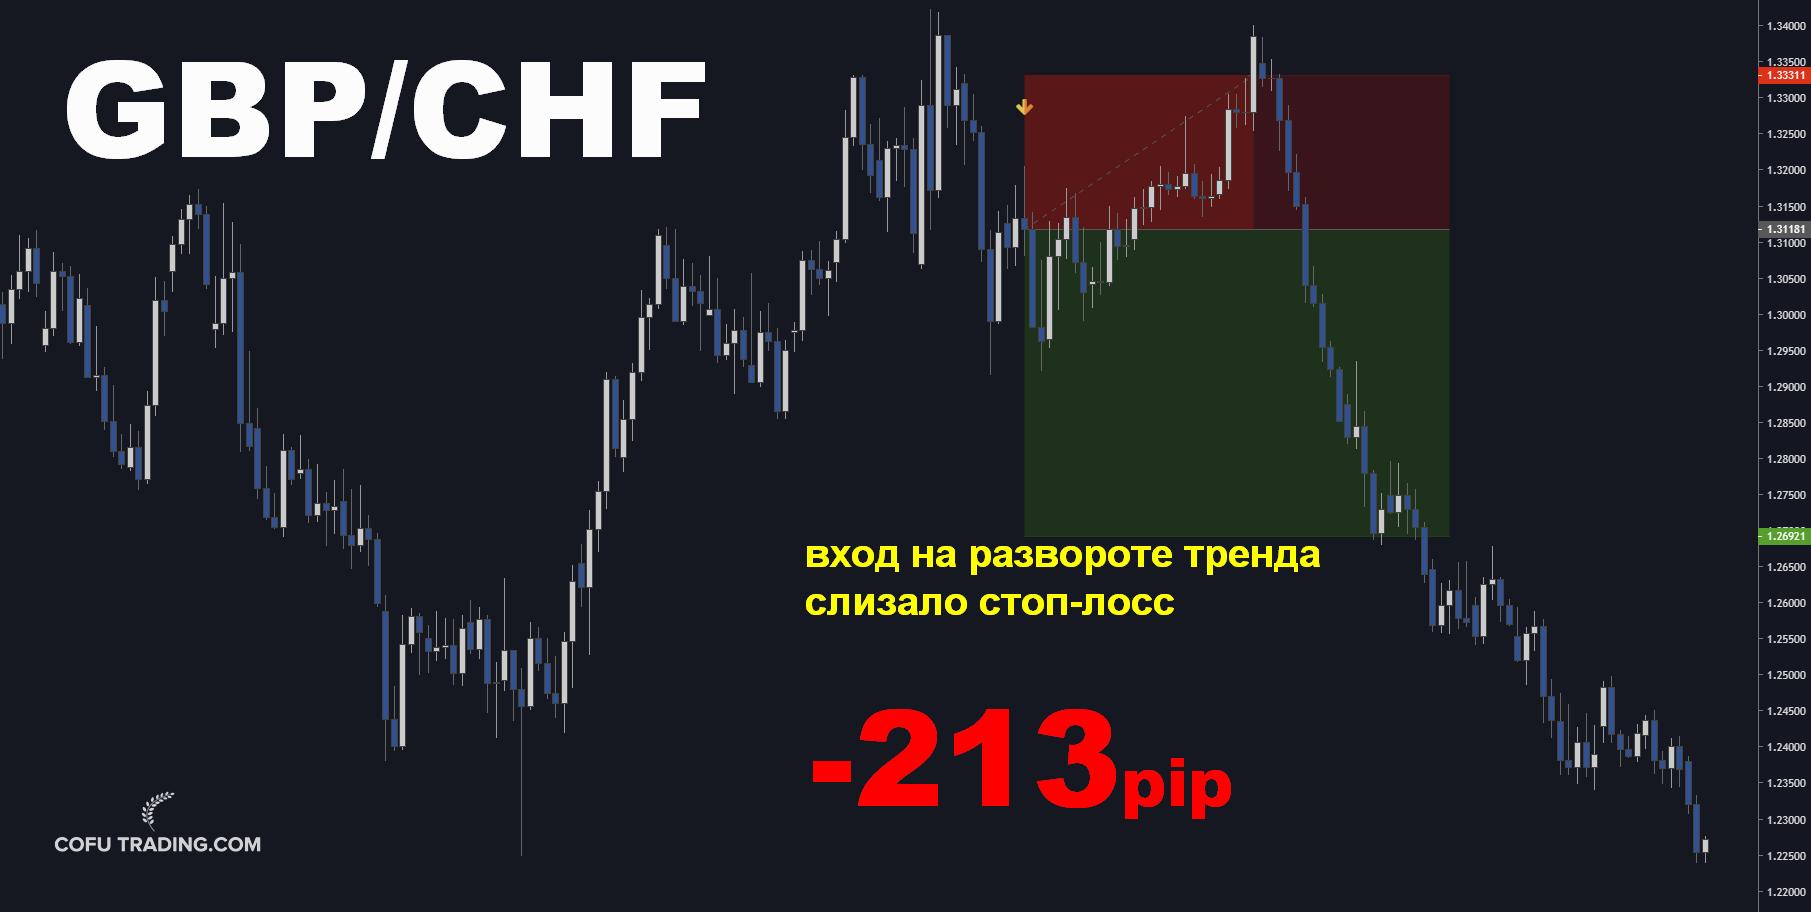 09-Cofutrading-short-gbp-chf.jpg